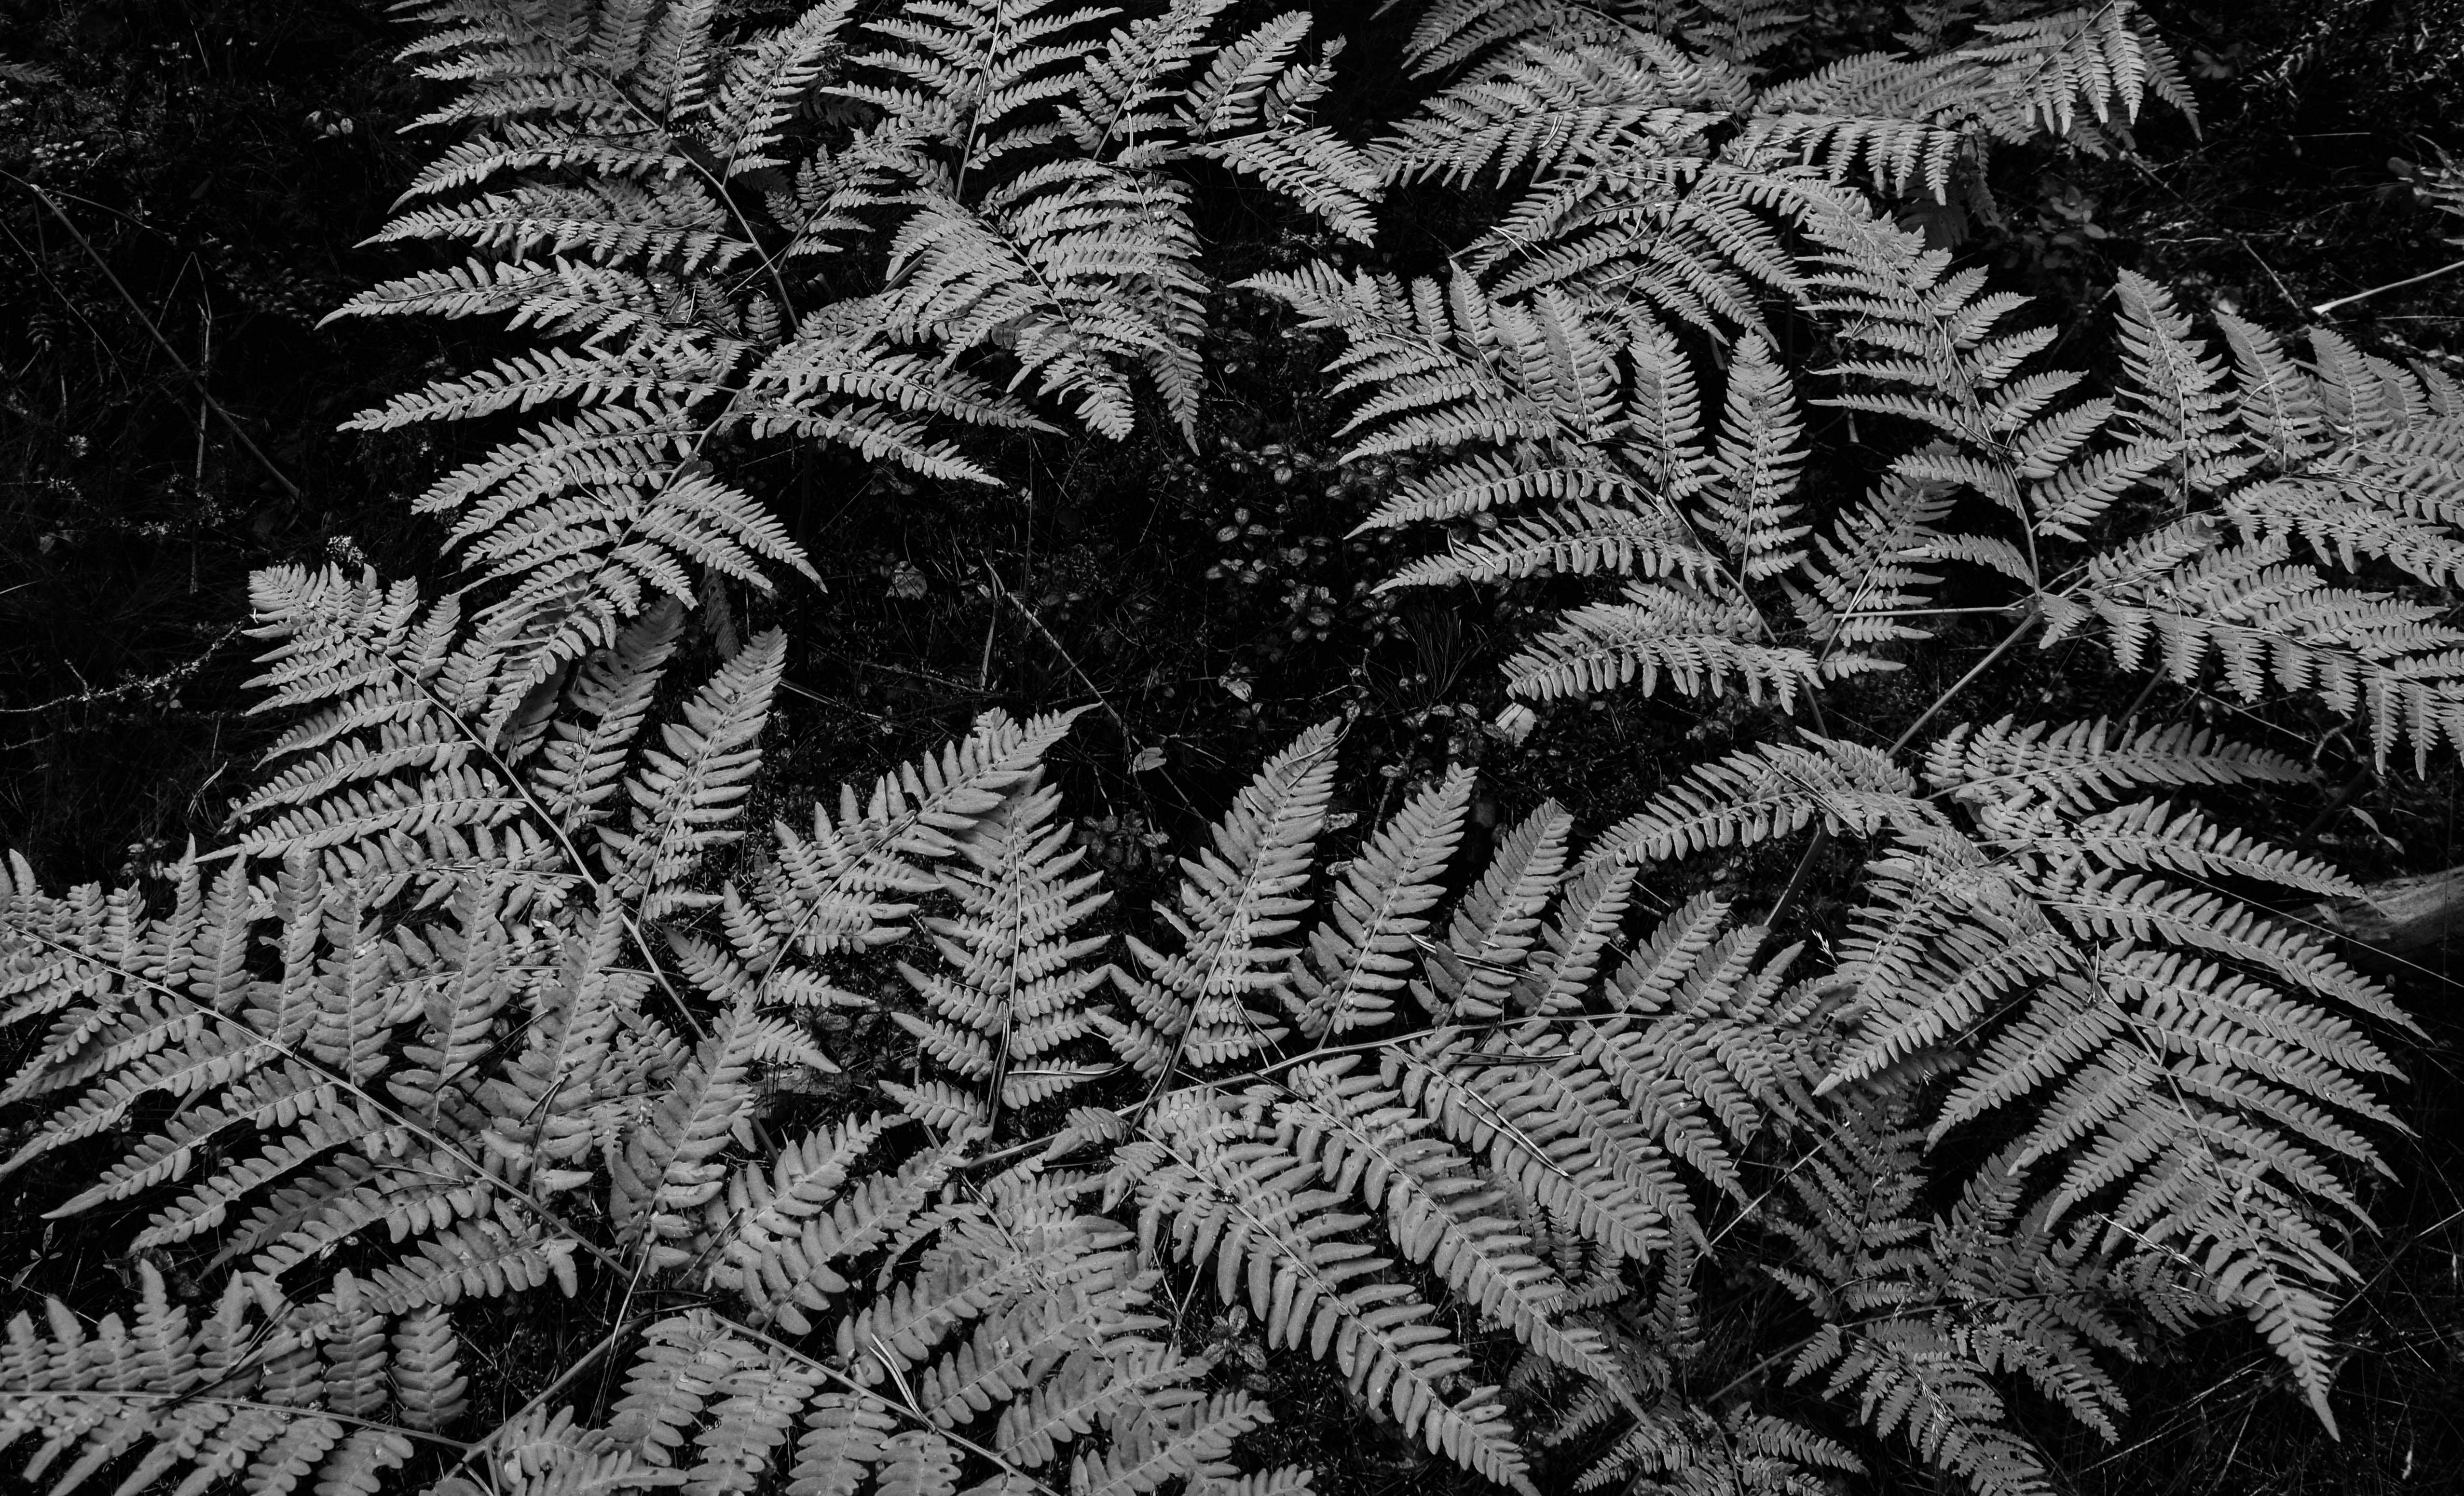 Grayscale Photo Of Fern Plants